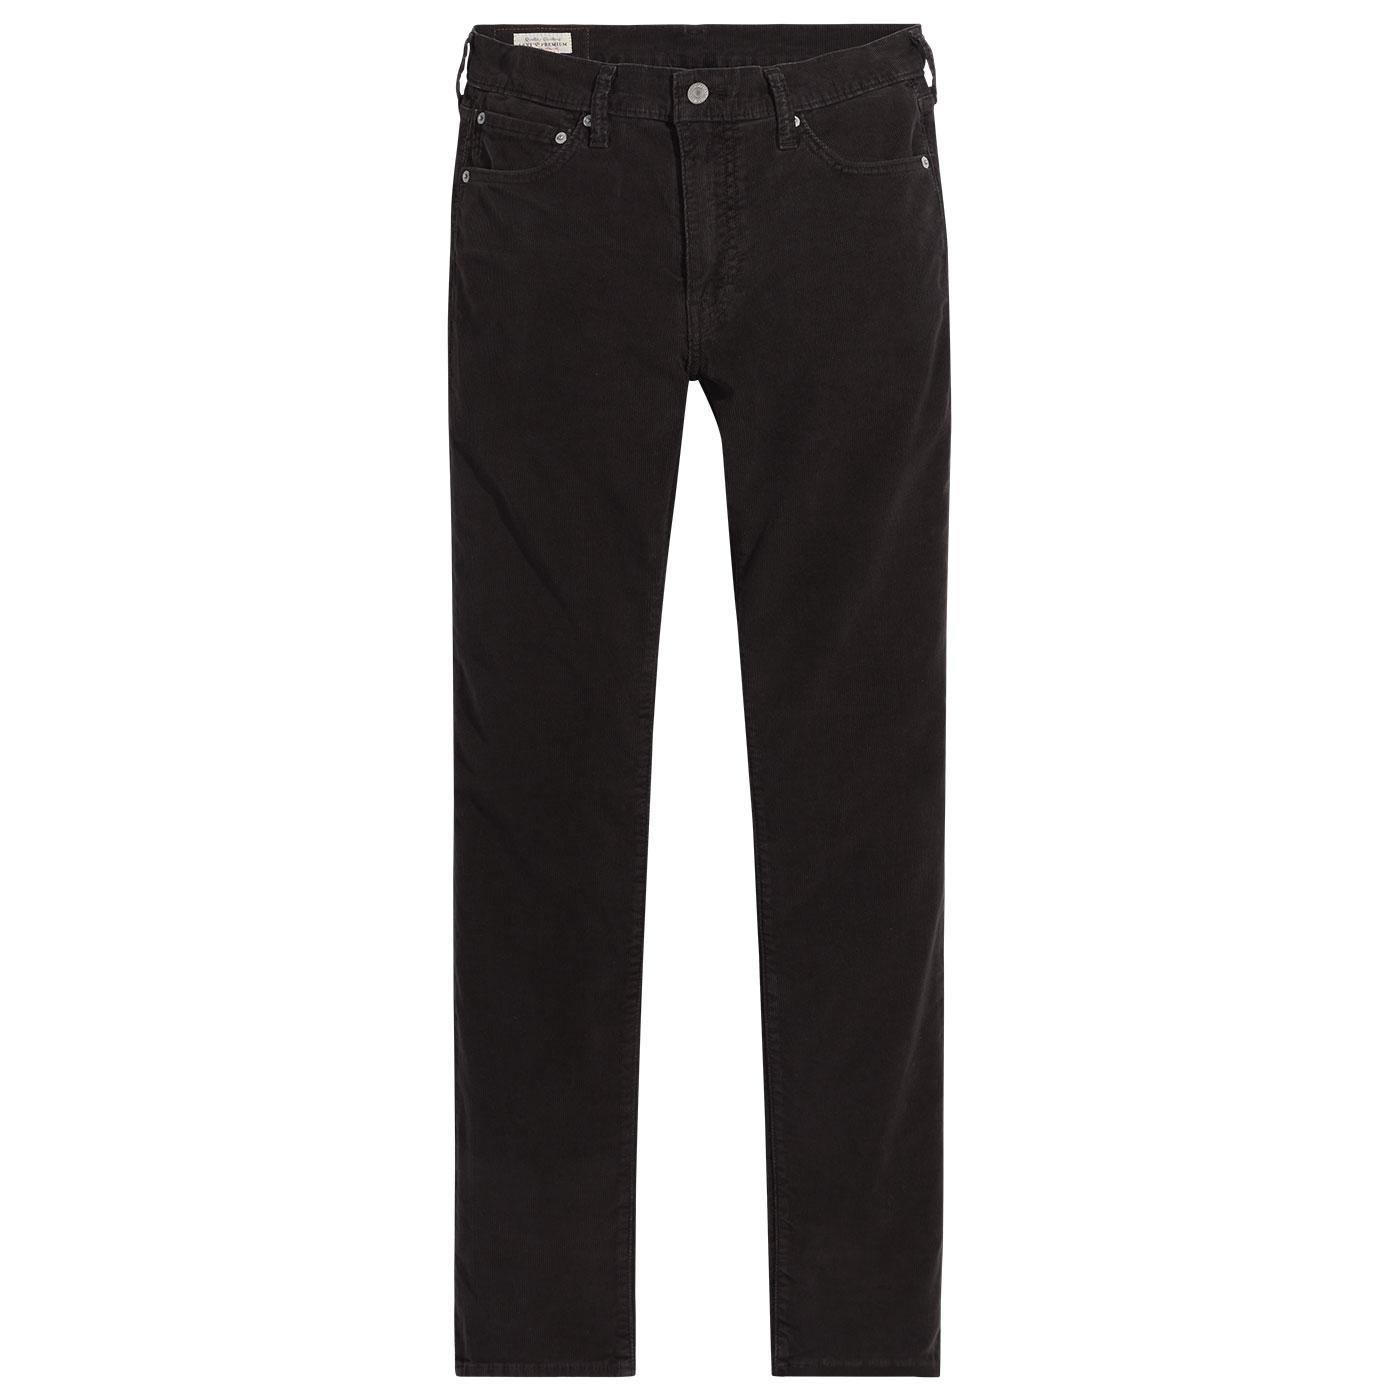 LEVI'S 511 Slim 14W Cord Mod Trousers (Meteorite)